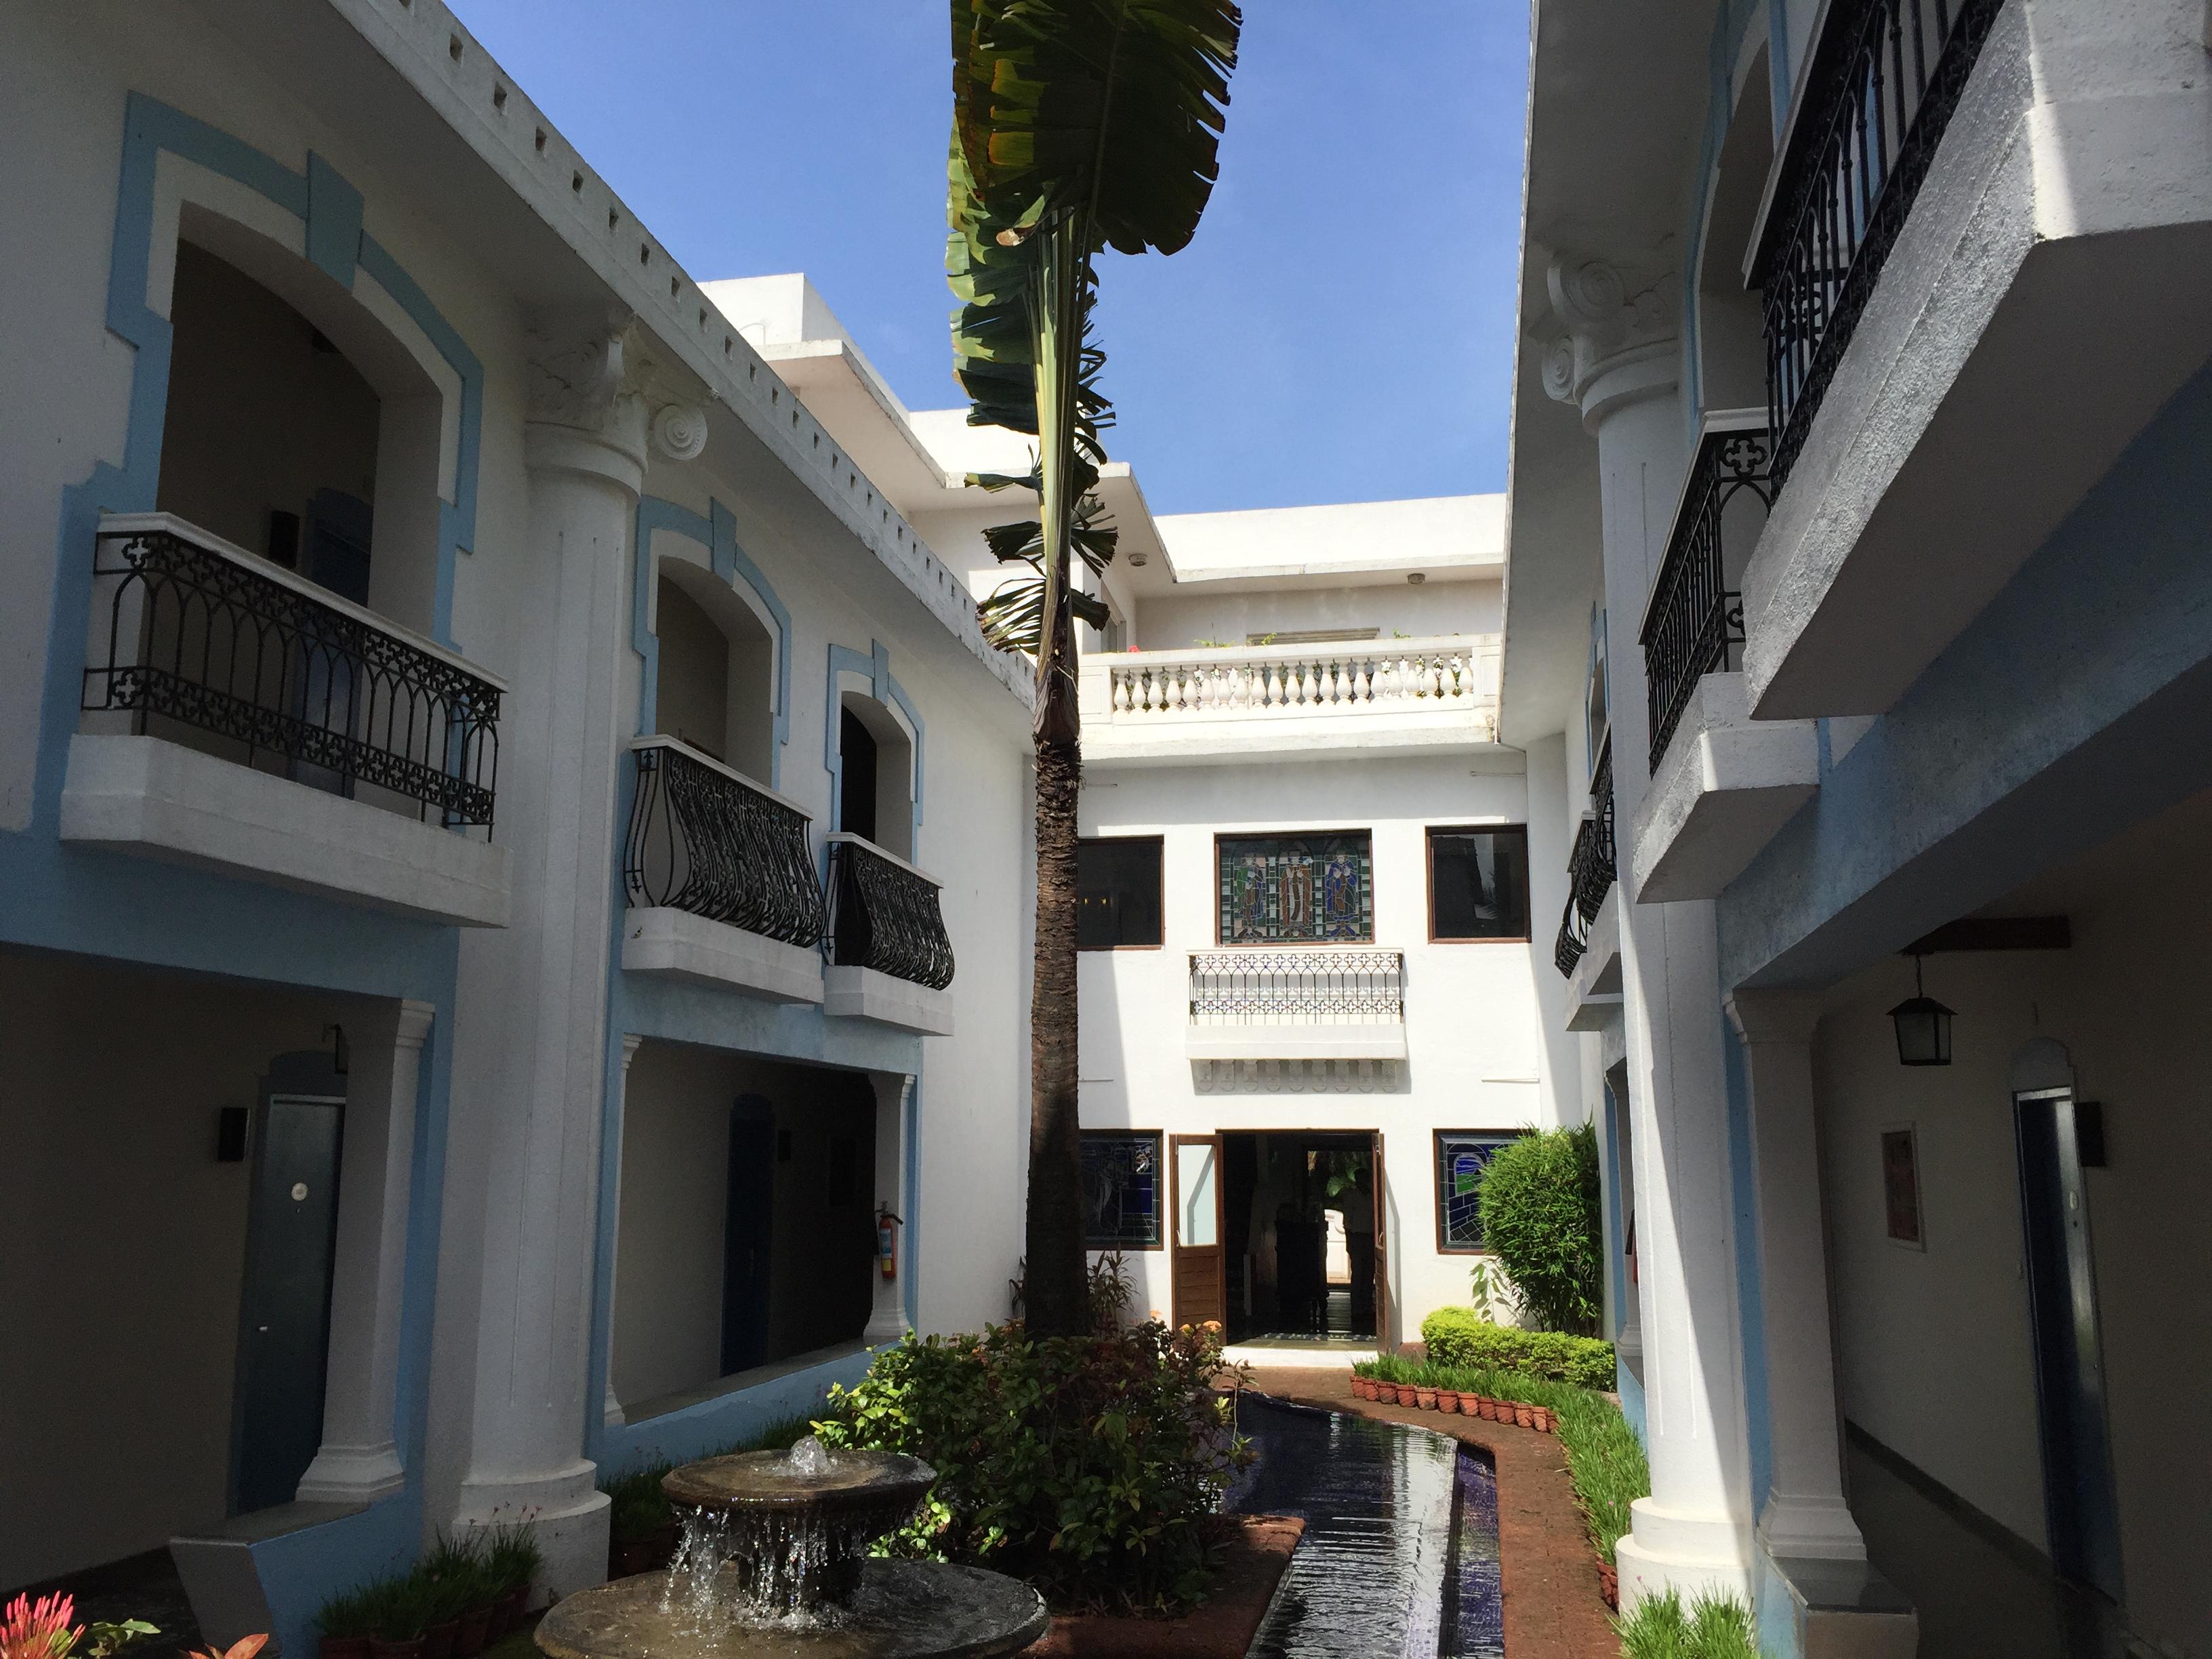 Lemon Tree Amarante Hotel - Hof mit Brunnen – Reisen in Indien